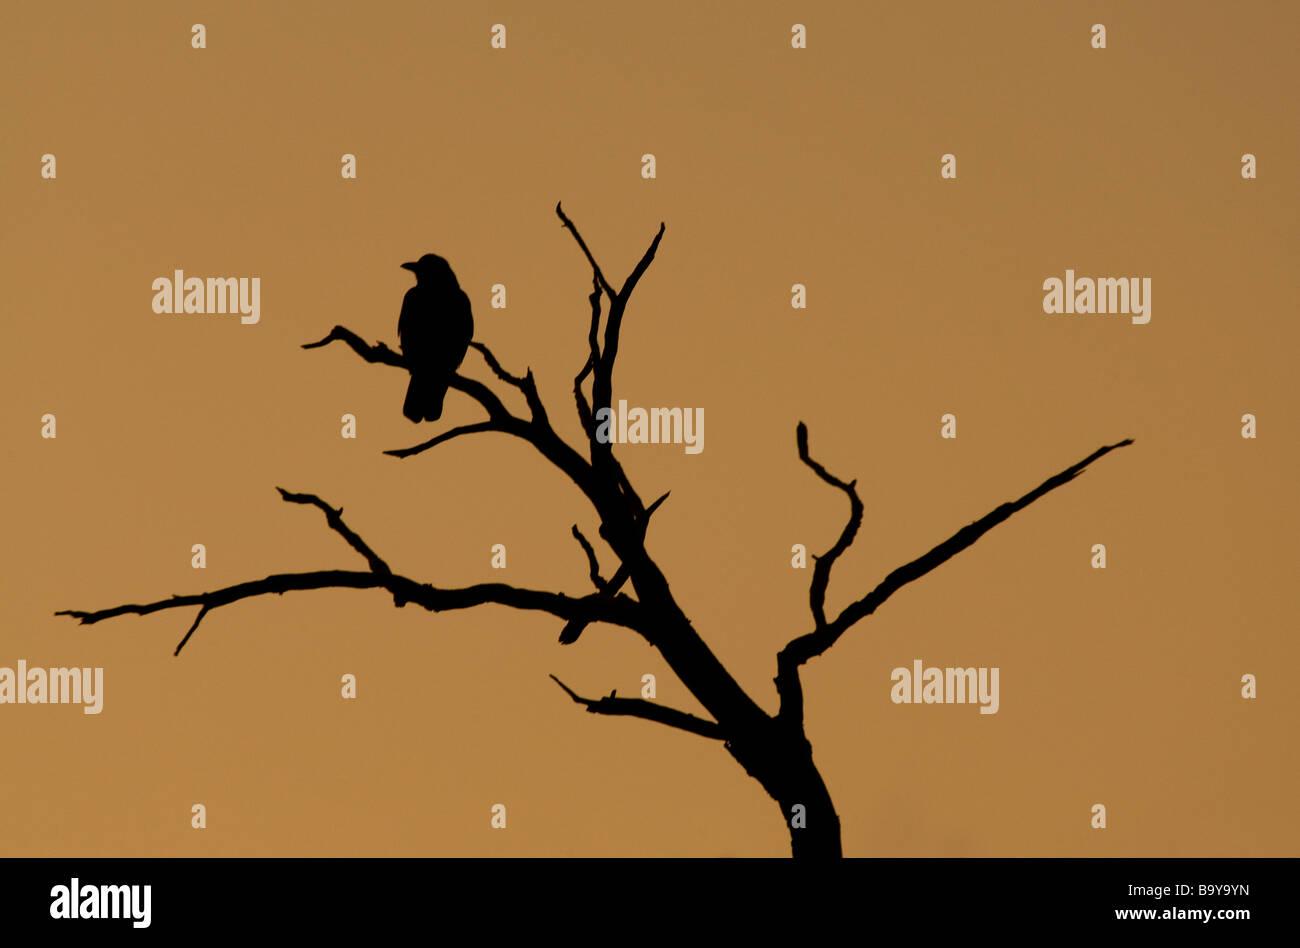 Silhouette der Krähe @ Tagesanbruch am Tristed branch Stockbild